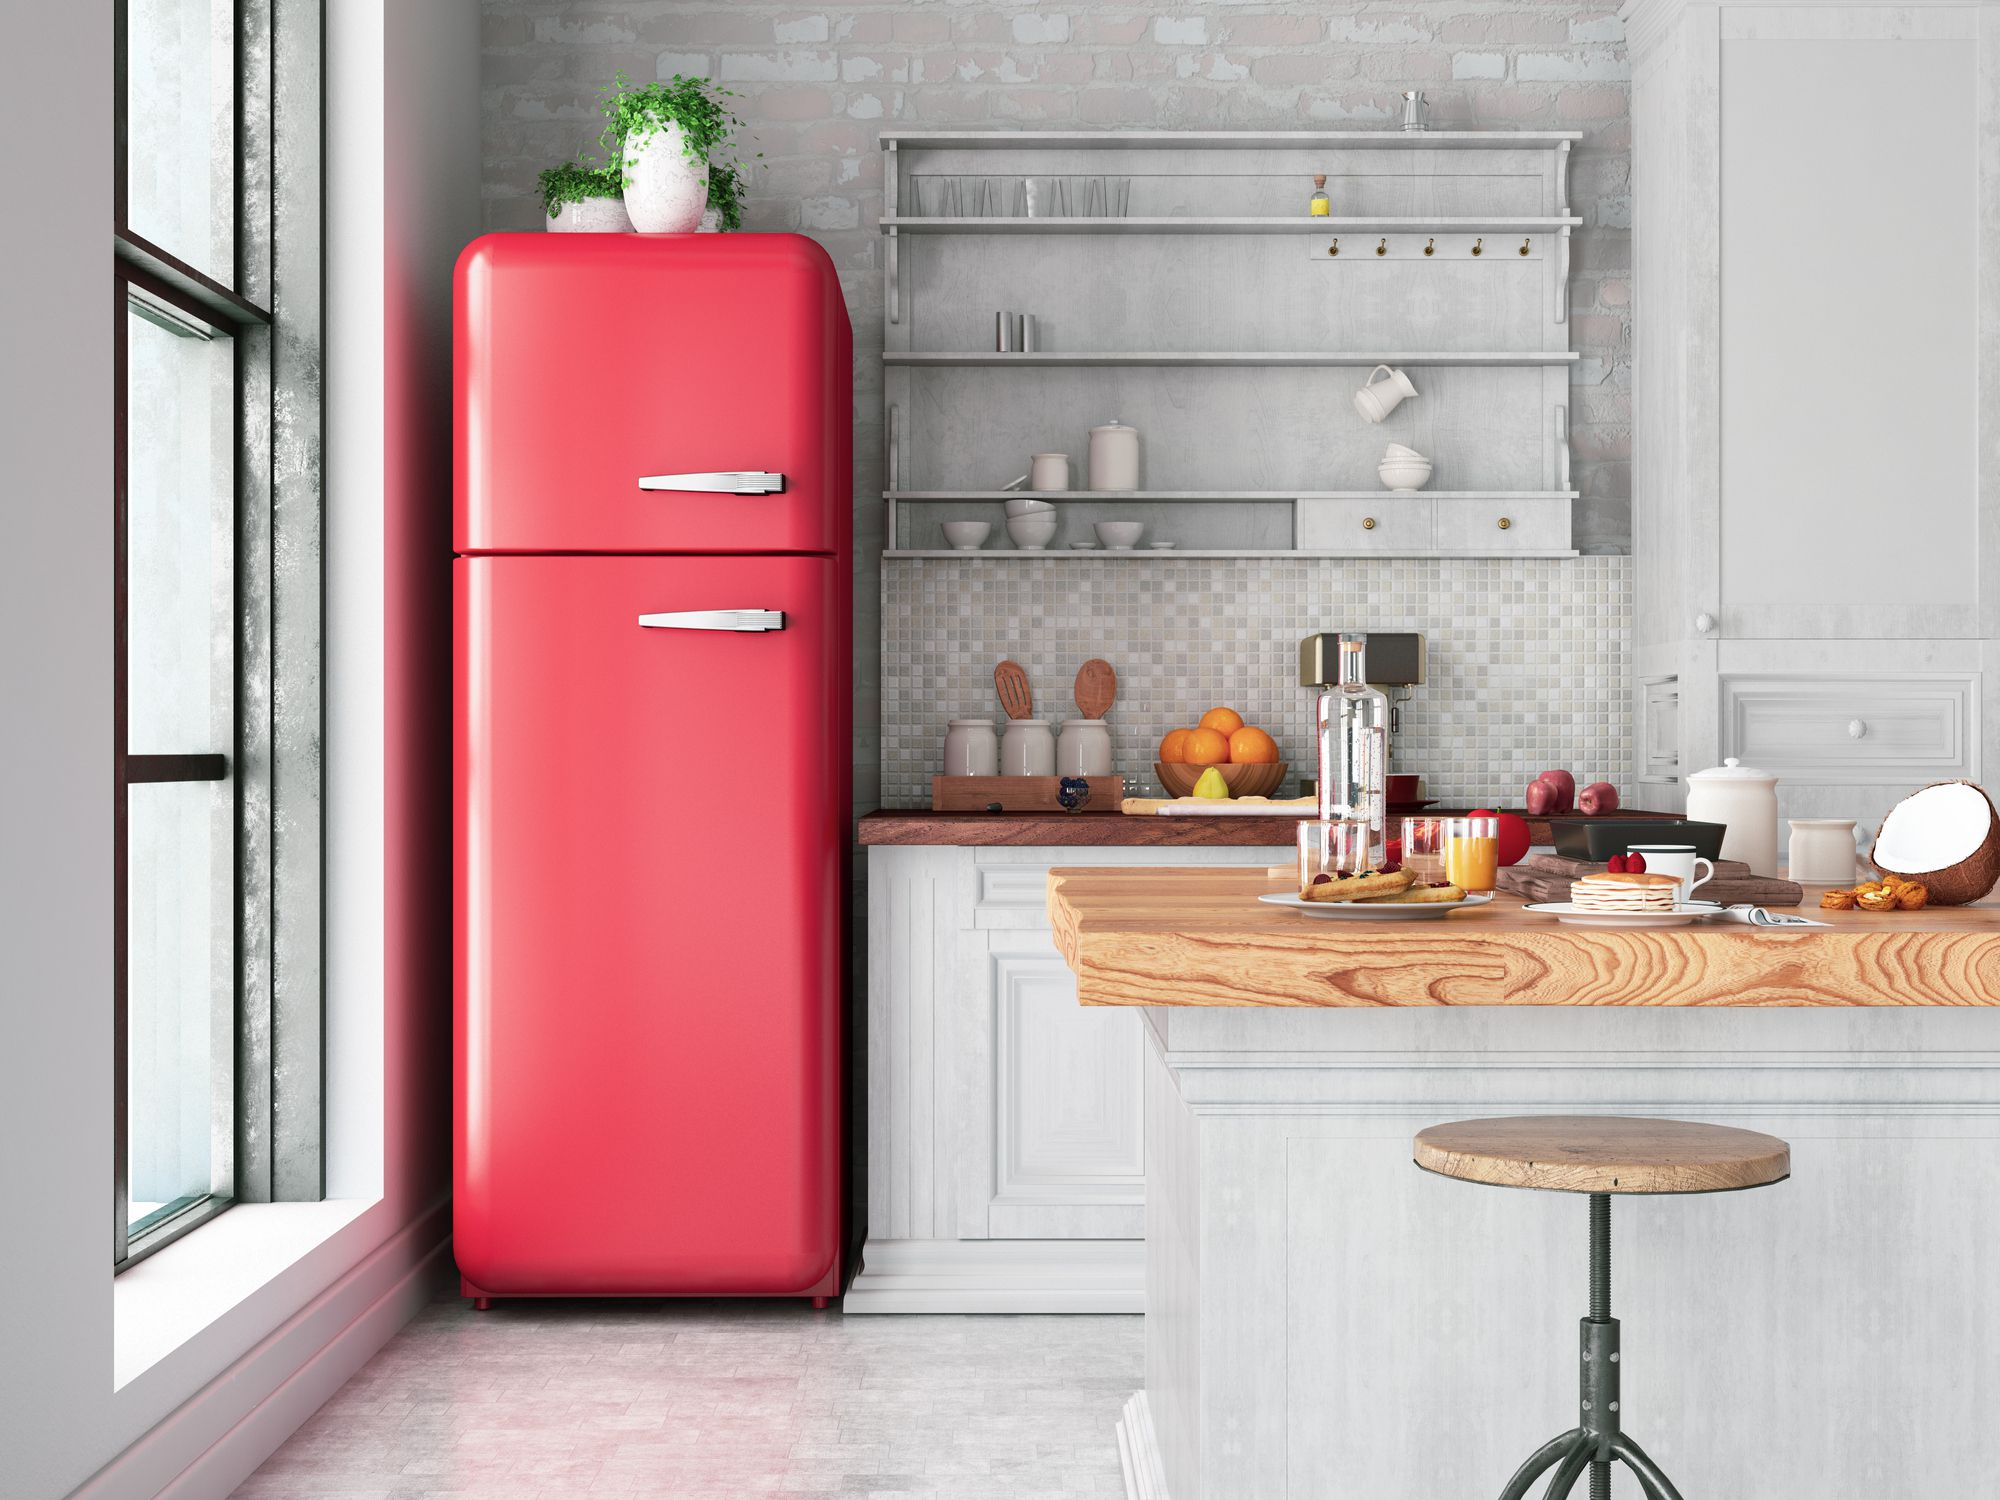 the 10 best refrigerator brands of 2021